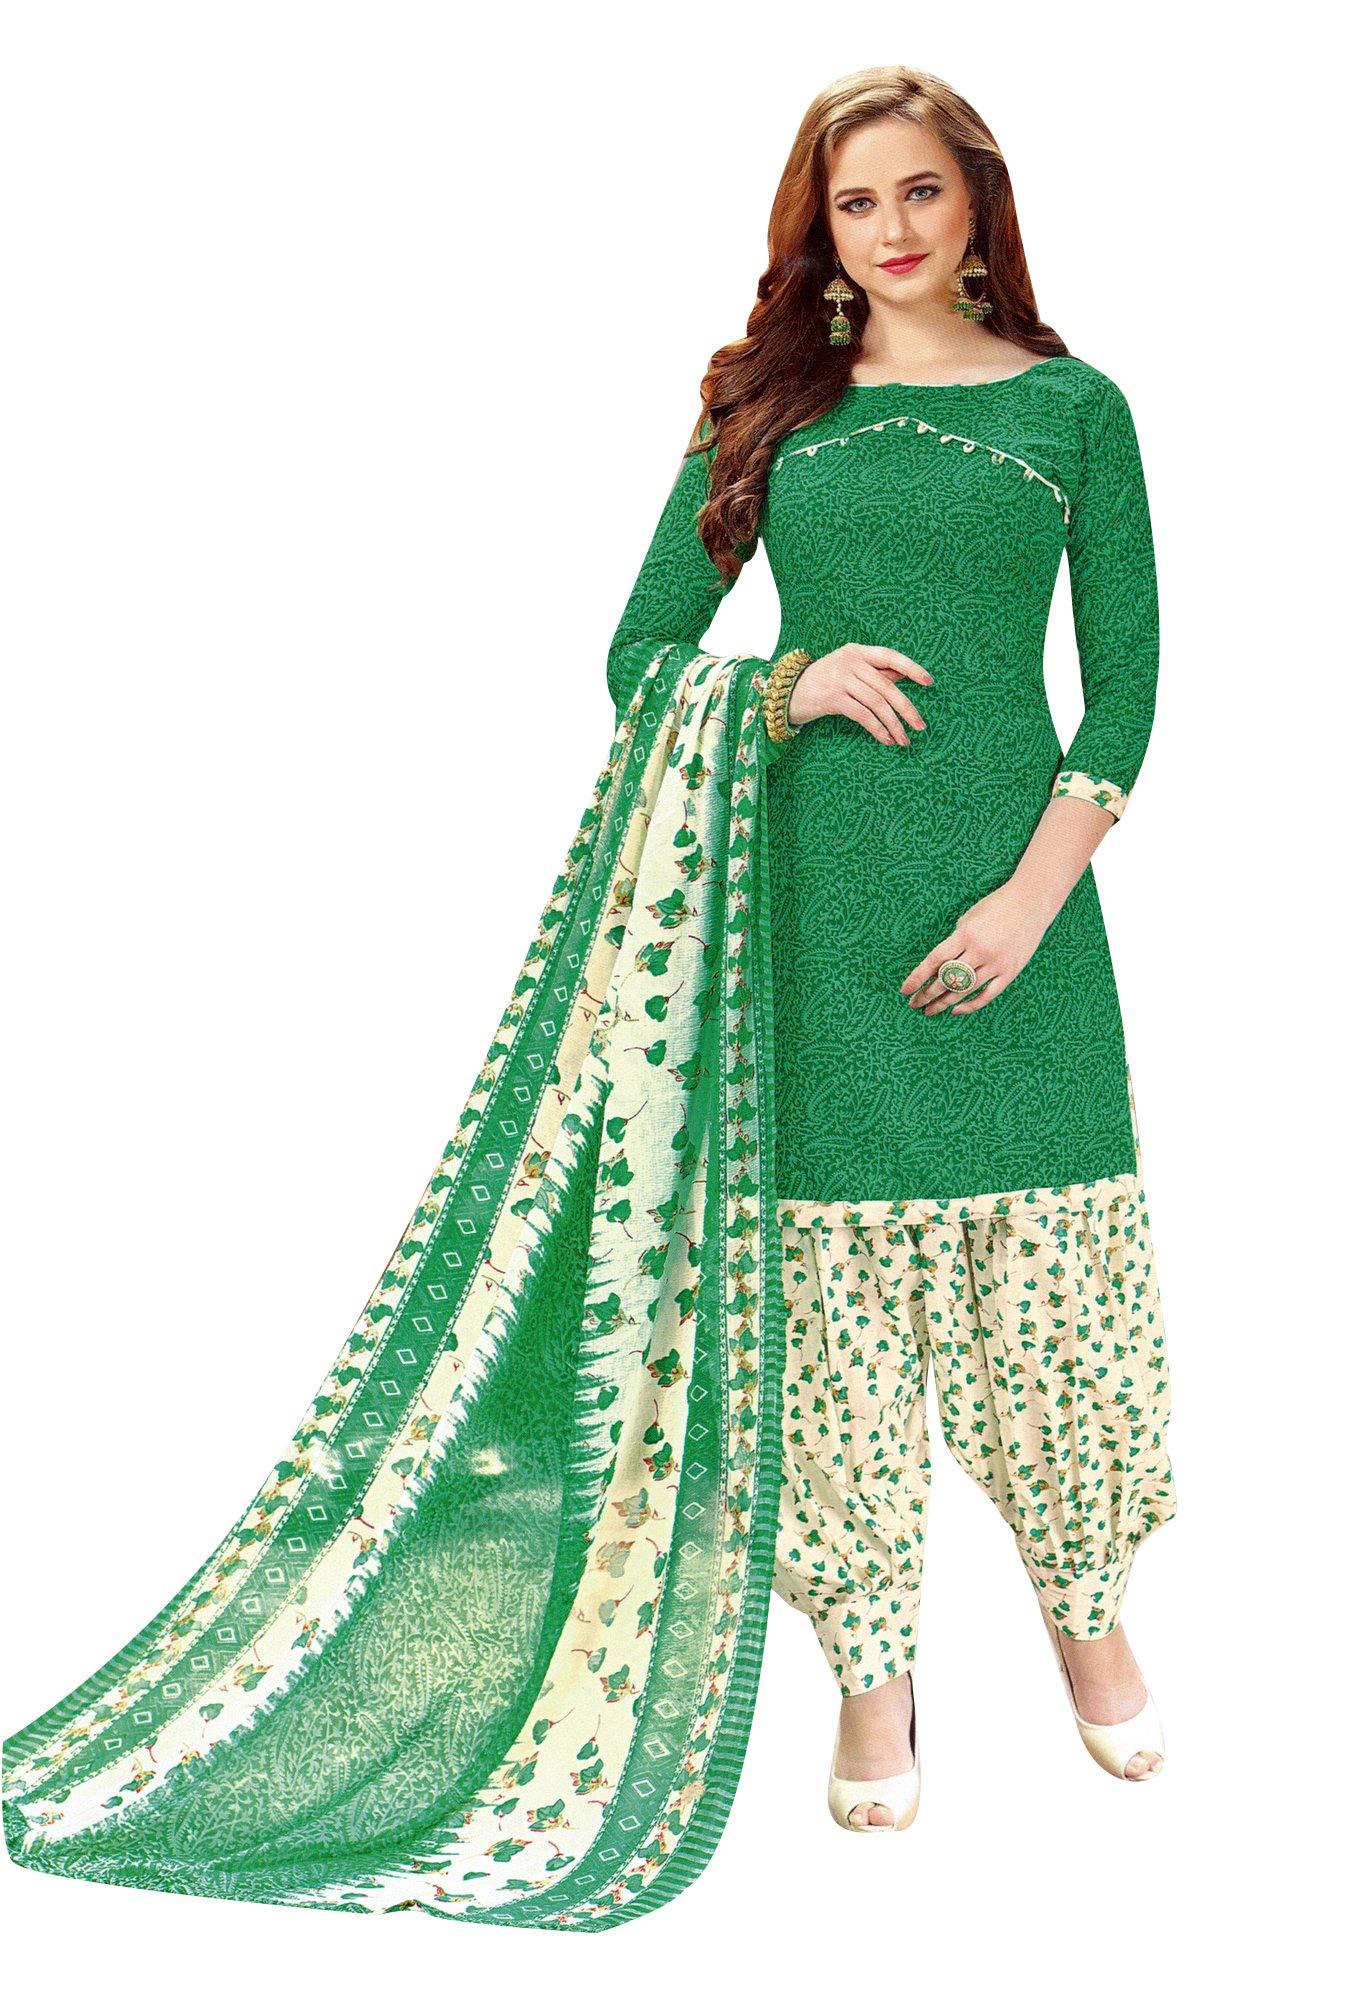 6e6173b737 Ladyline Womens Cotton Salwar Kameez Printed Patiala Salwar ...